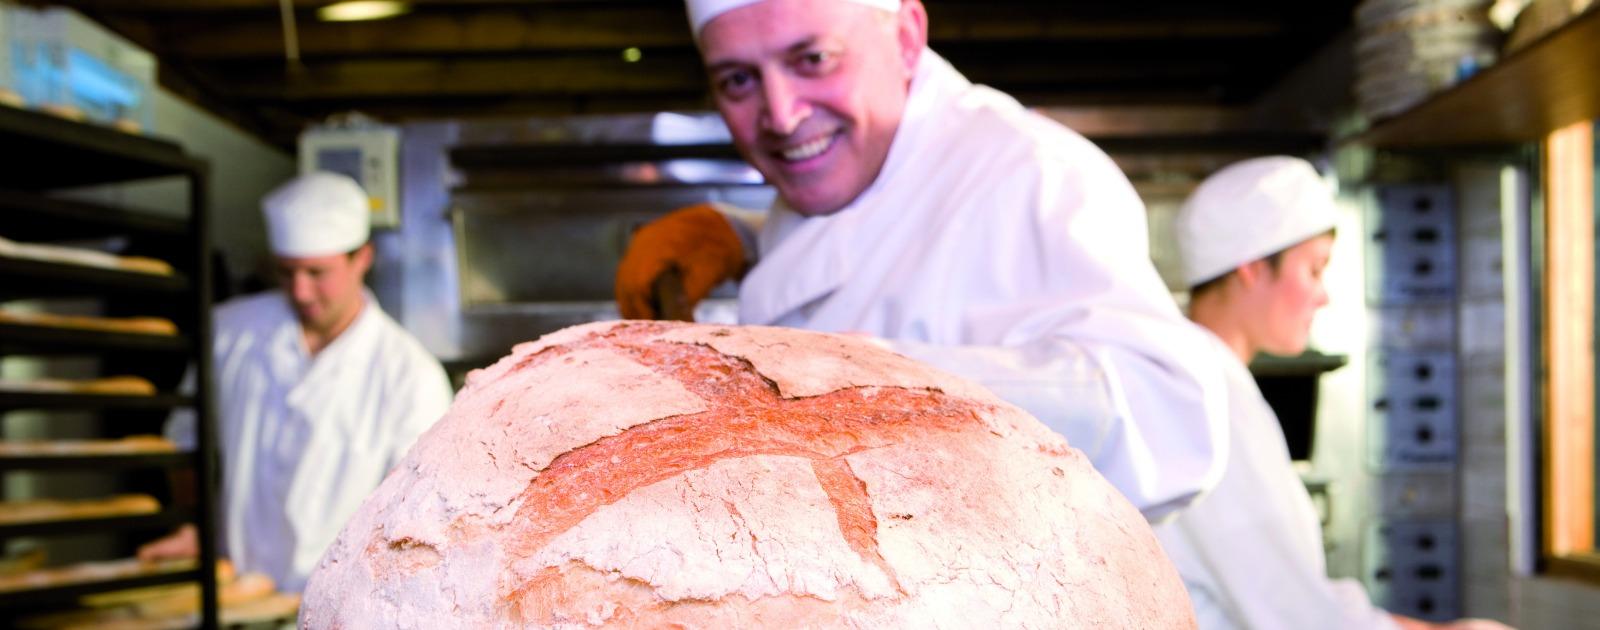 Boulanger enfourne pain